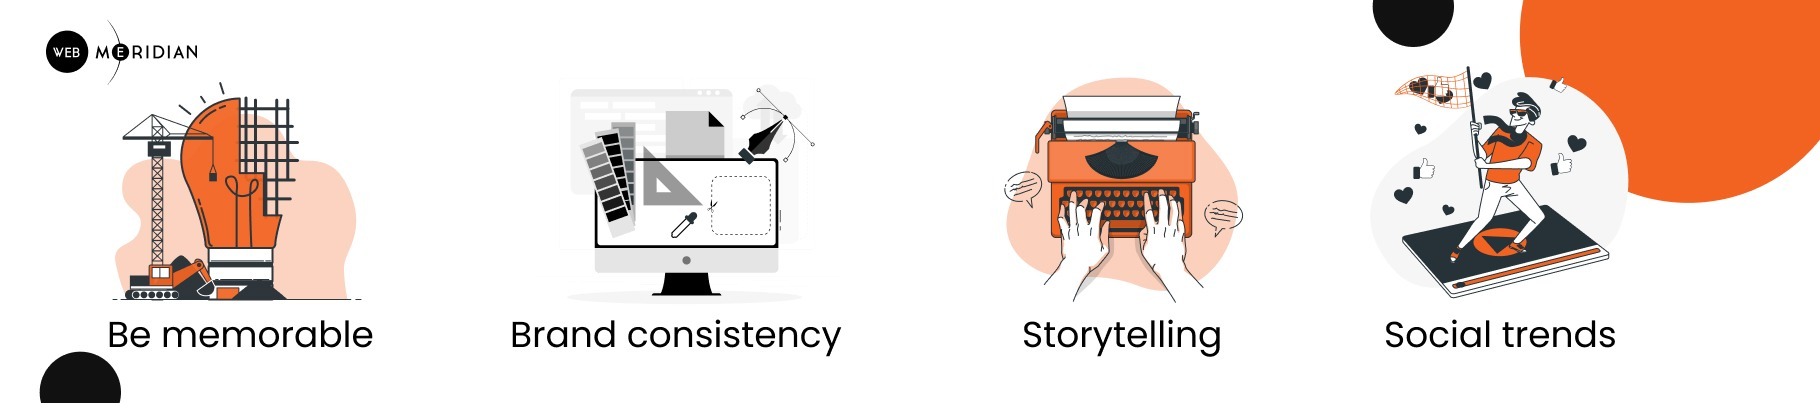 Web page design layout